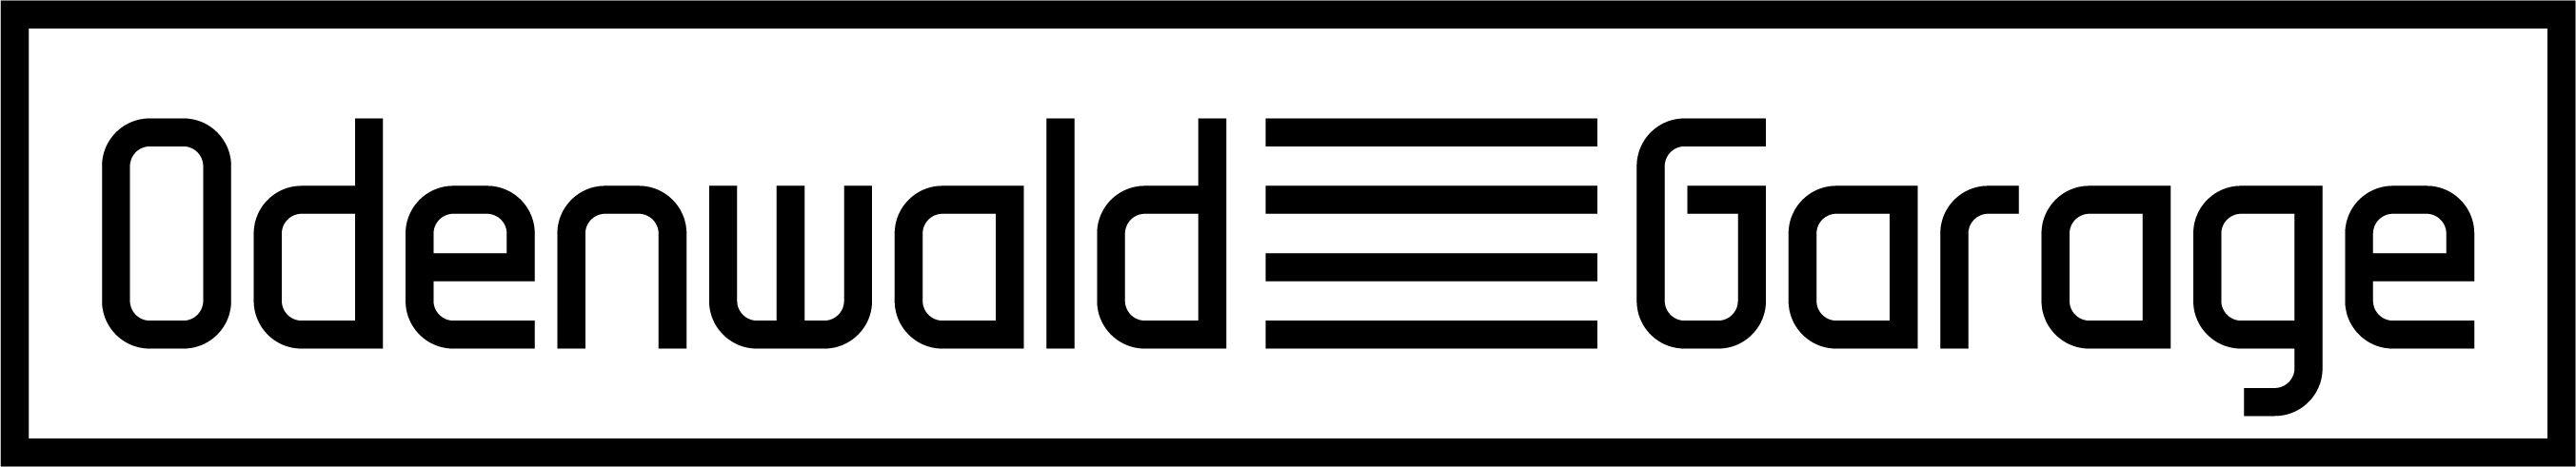 Odenwaldgarage logo